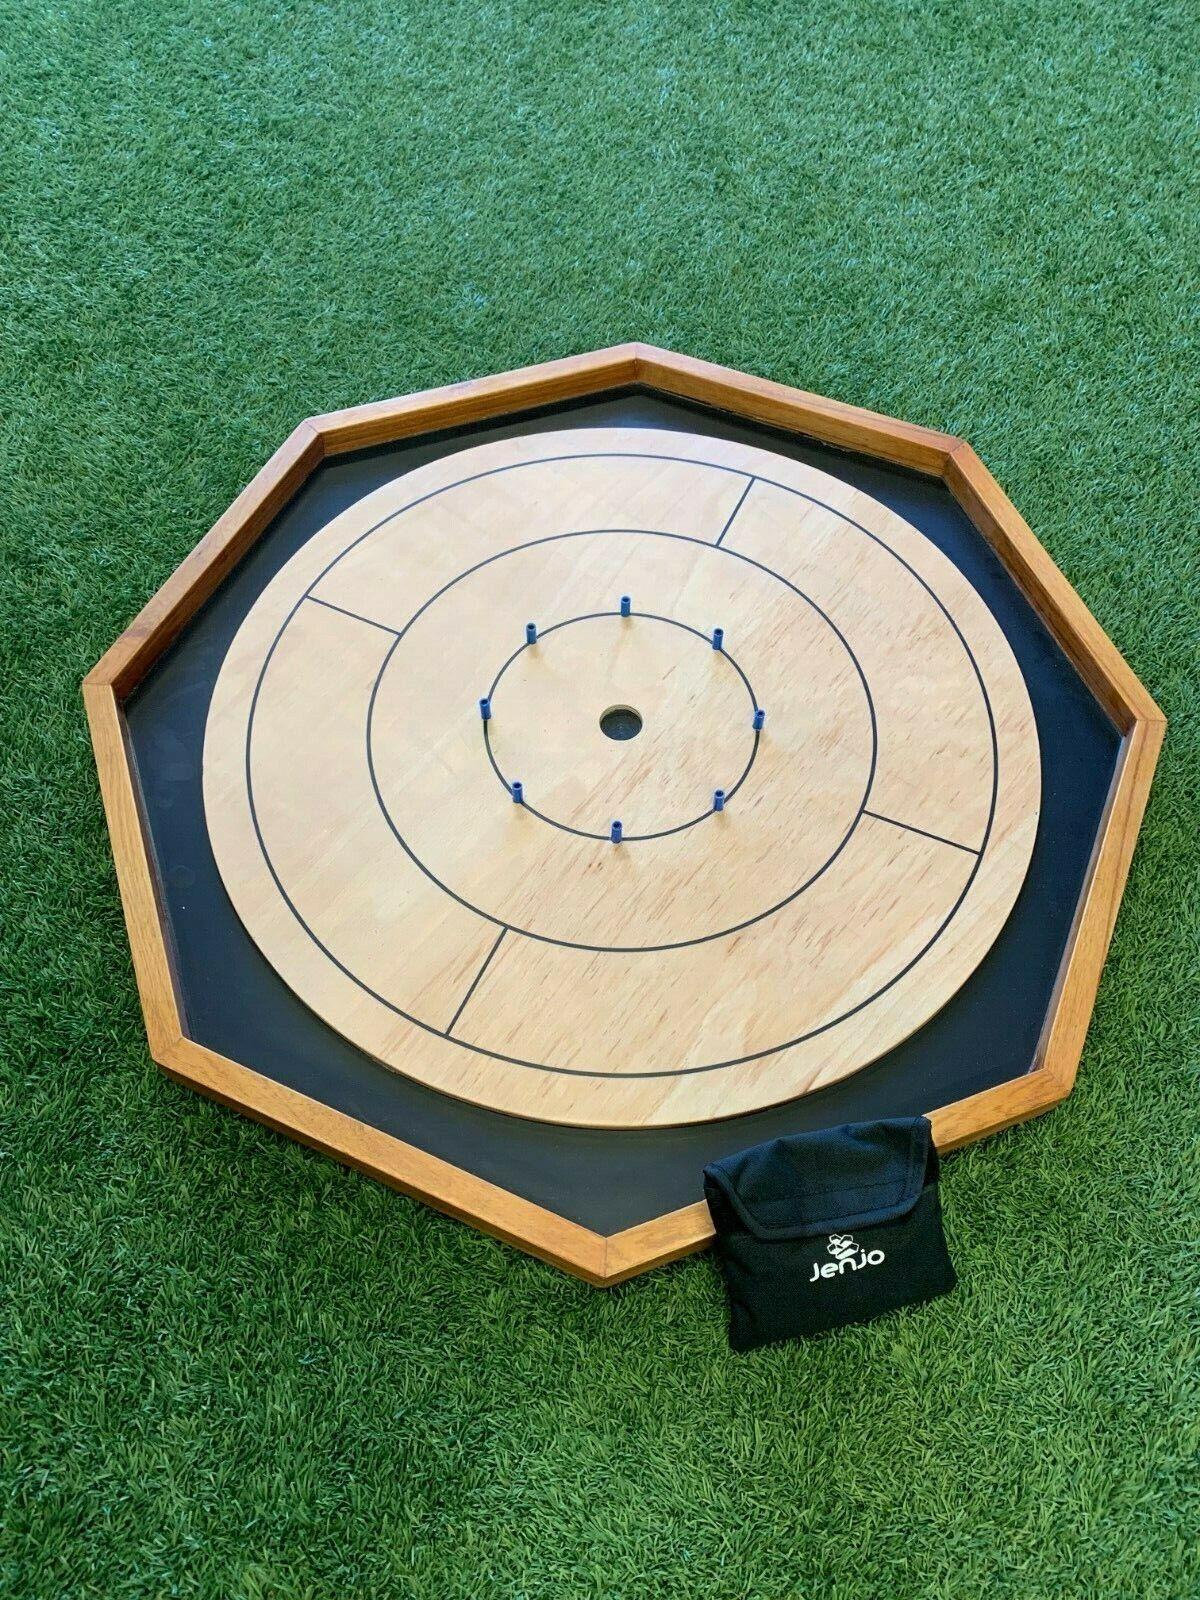 Crokinole Octagon Wooden Board Game | eBay